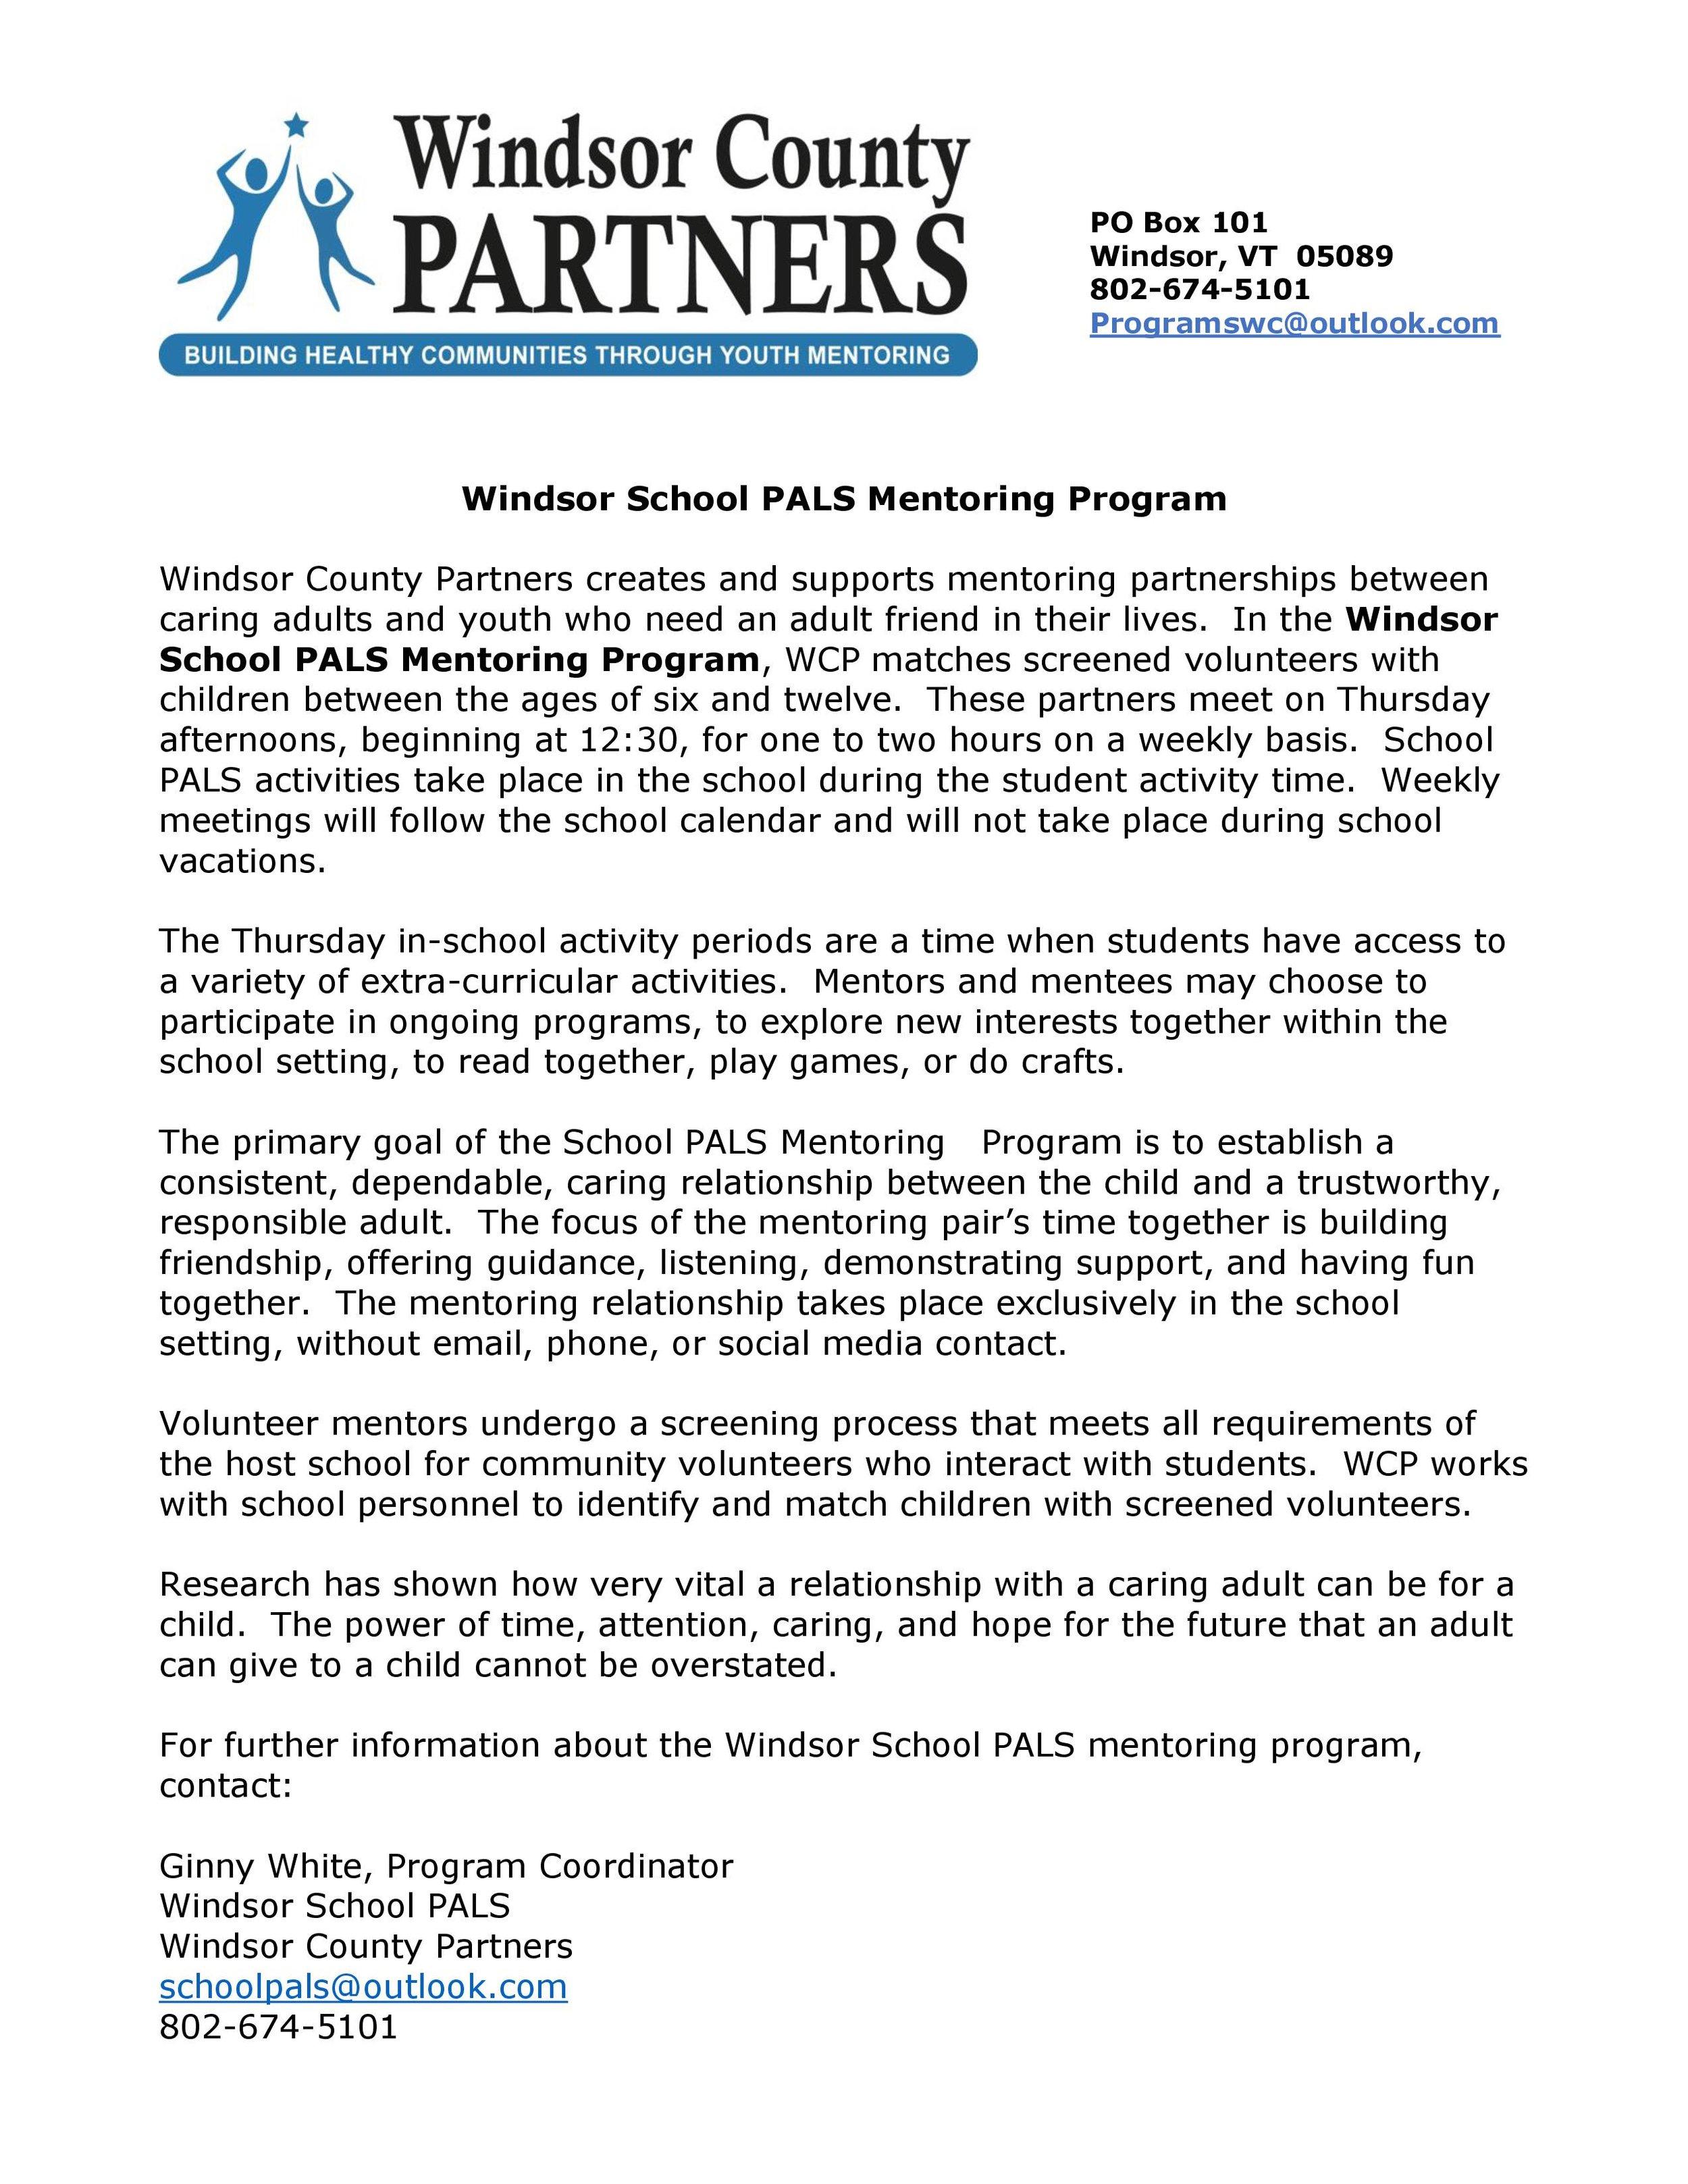 Windsor SchoolPALS prog description Oct 2018-1 2.jpg